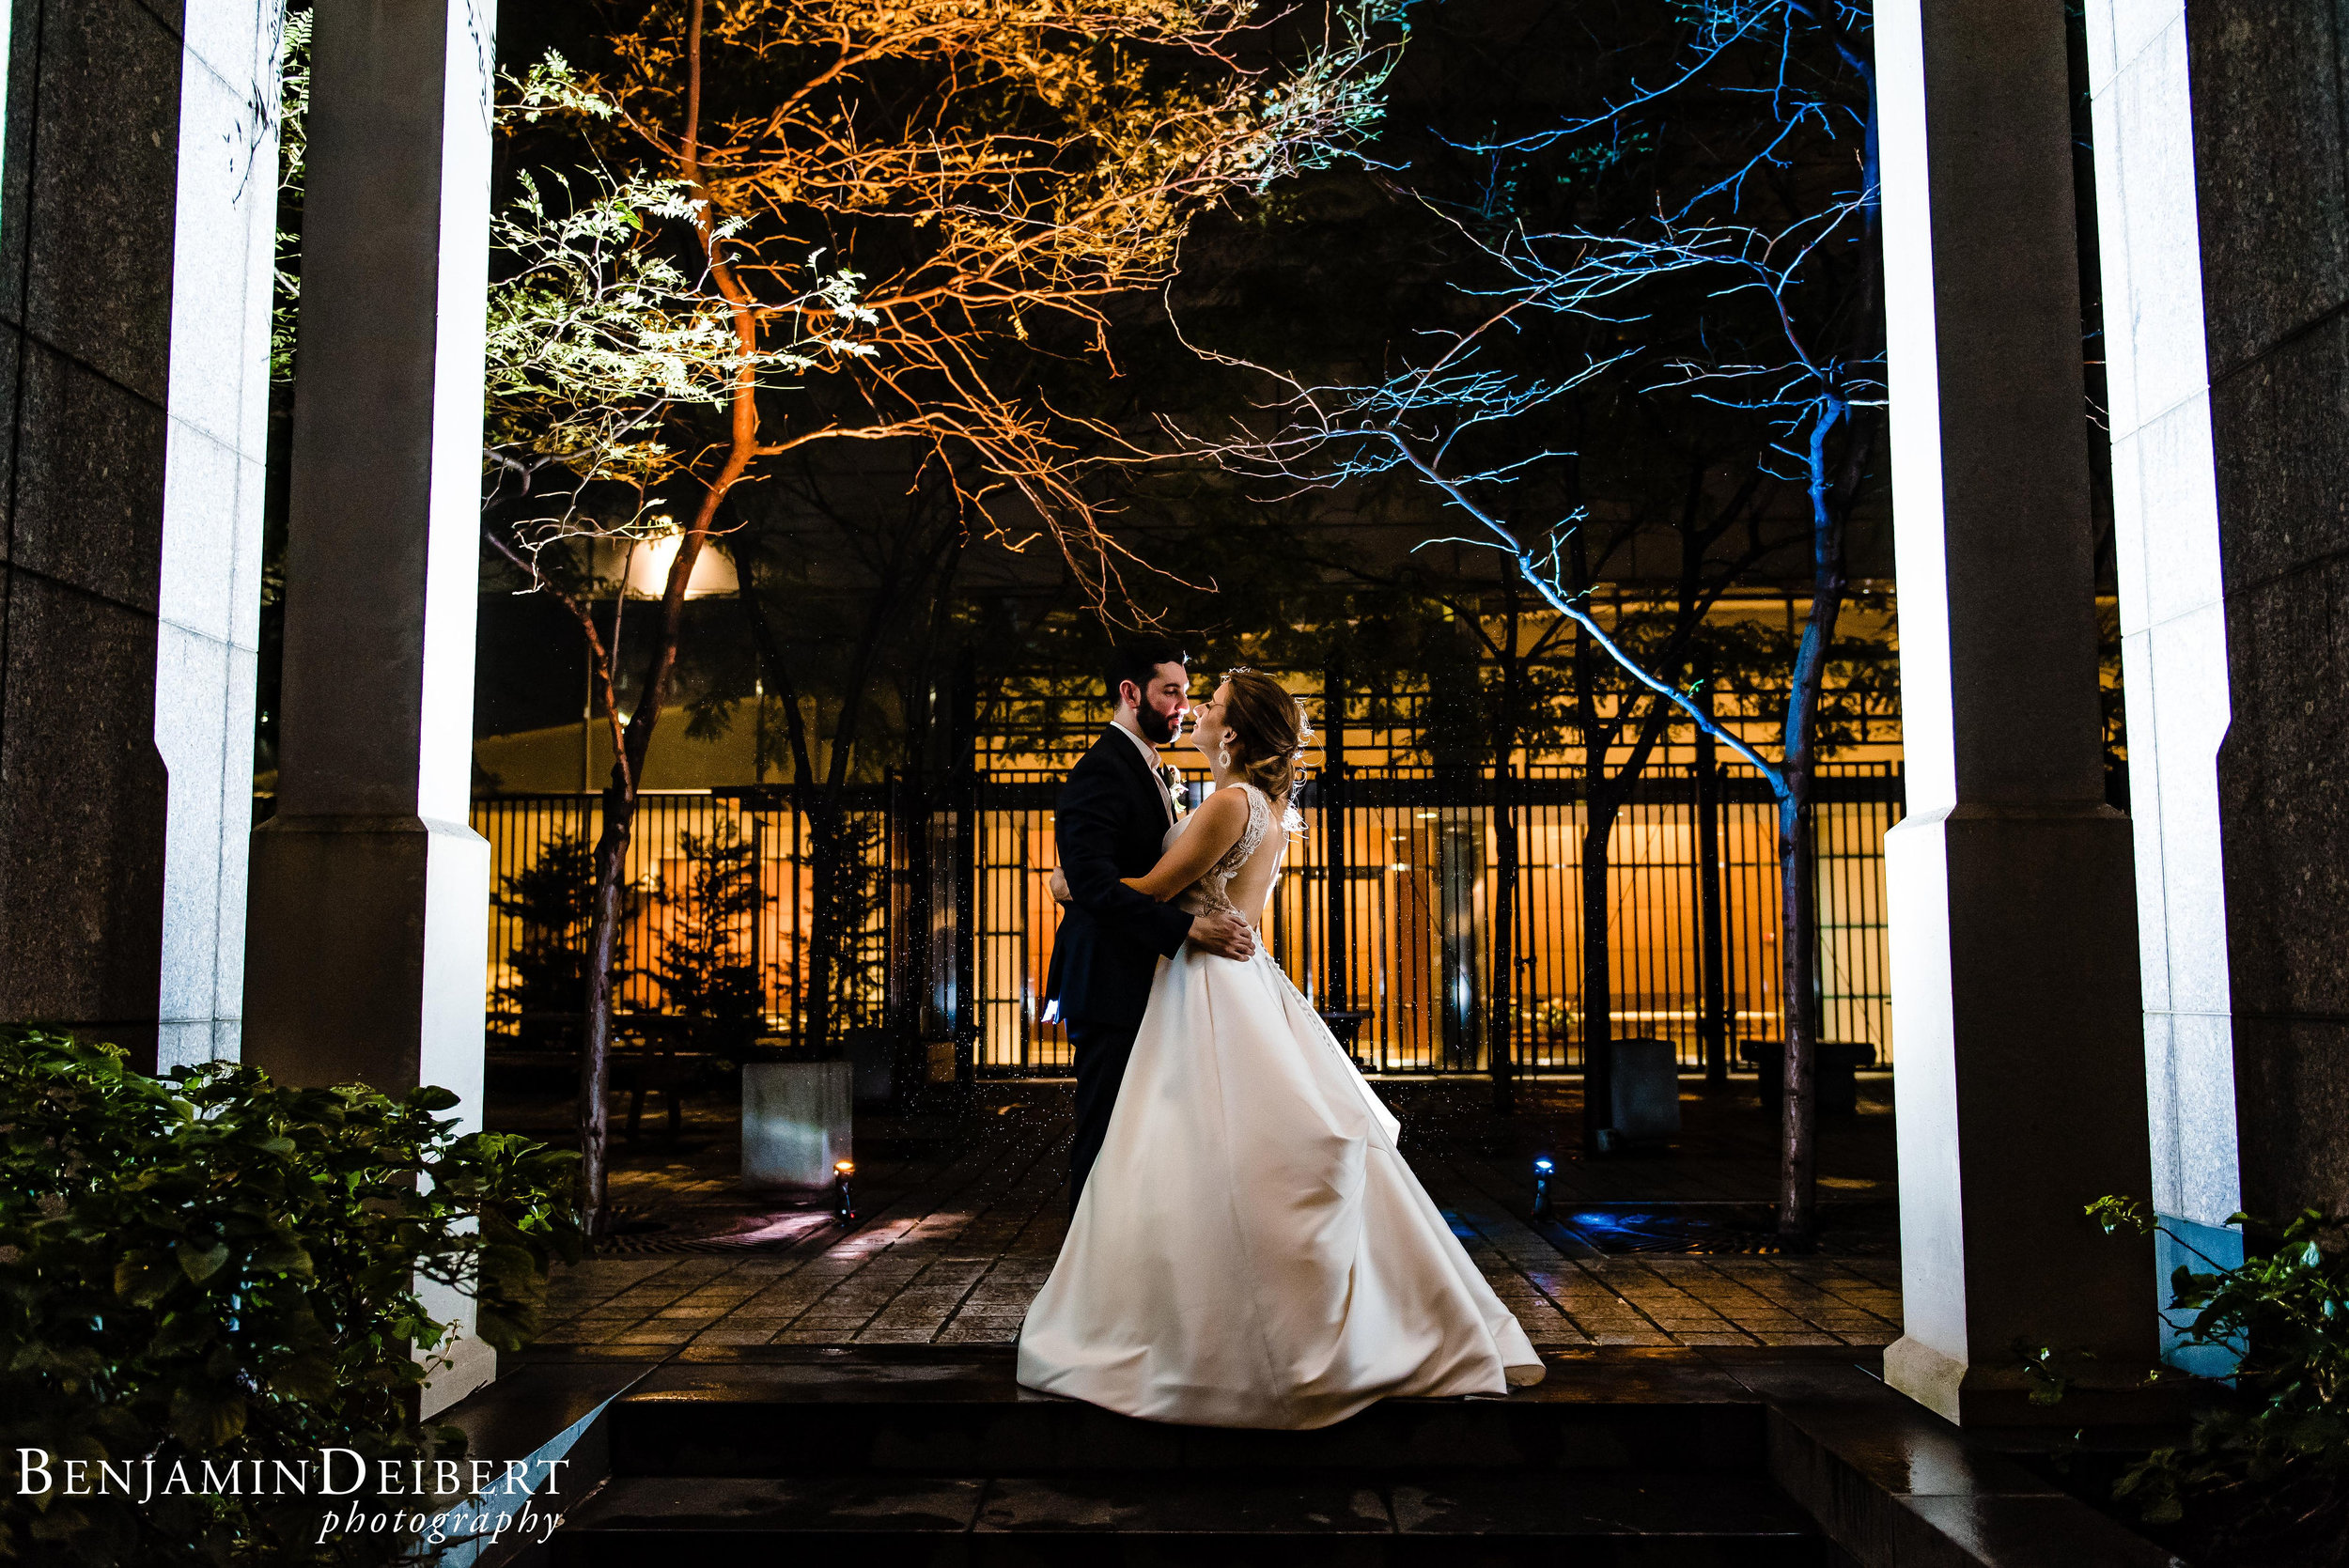 CatherineandDaniel_ThePyramidClub_Wedding-1.jpg